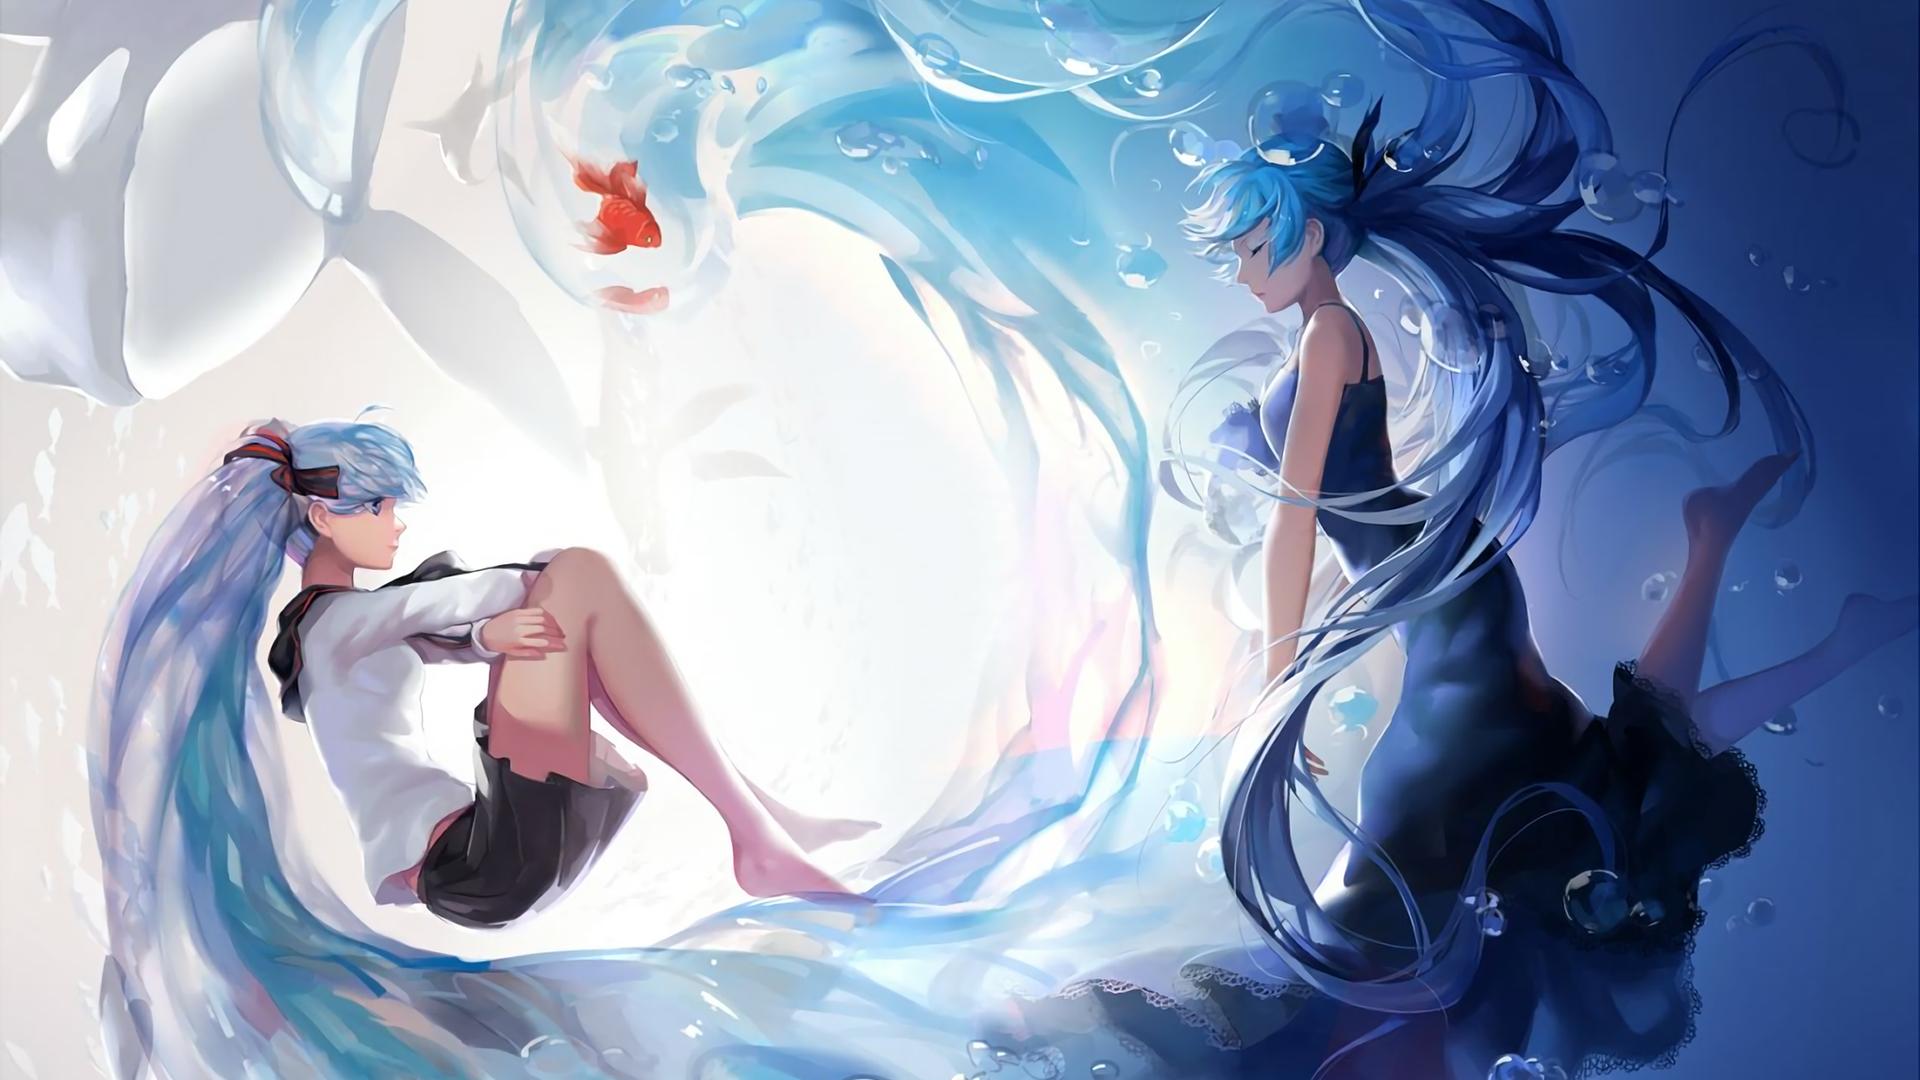 Anime-Vocaloid-Hatsune-Miku-wallpaper-wp3602569